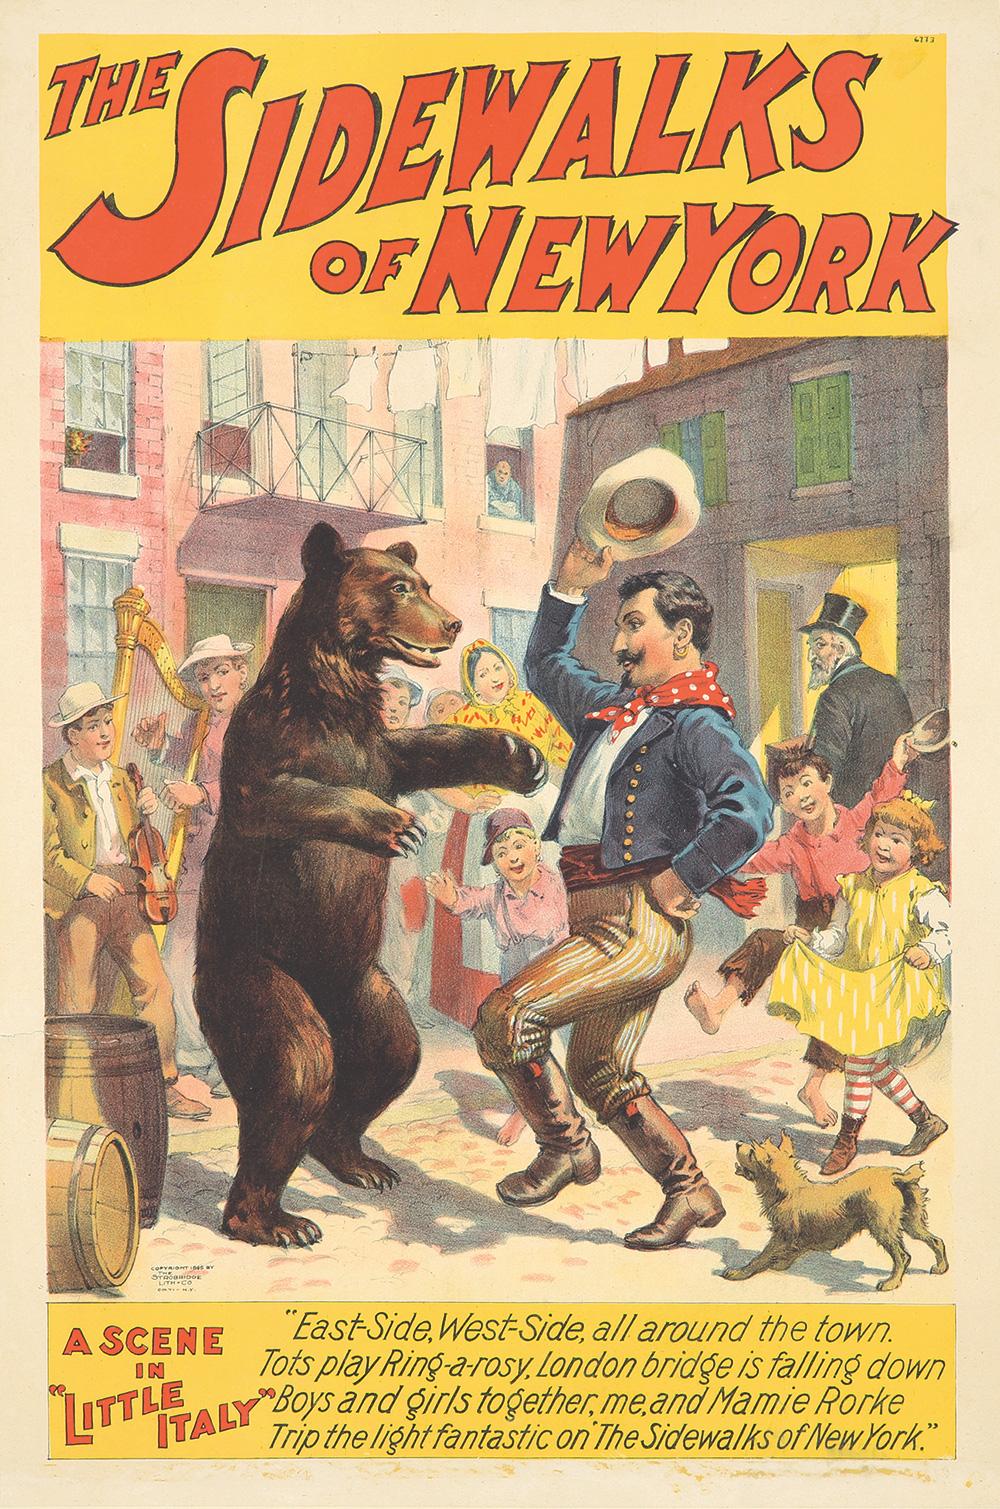 162. The Sidewalks of New York. 1895.